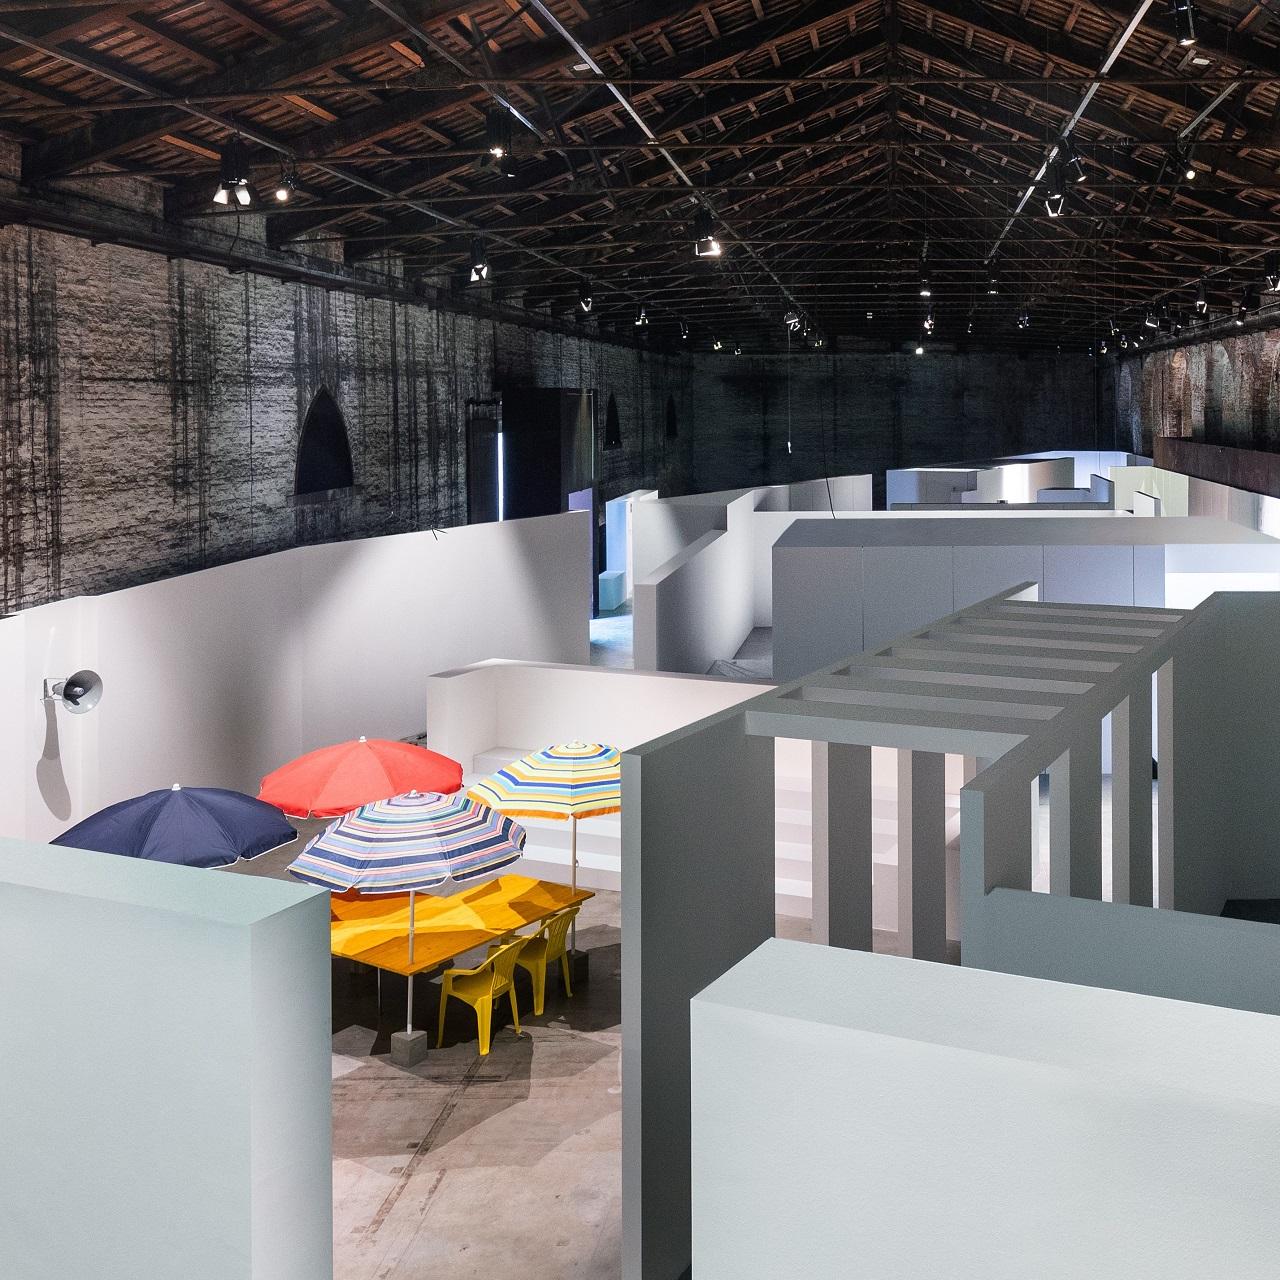 Italian Pavilion | 58th International Art Exhibition   of La Biennale di Venezia